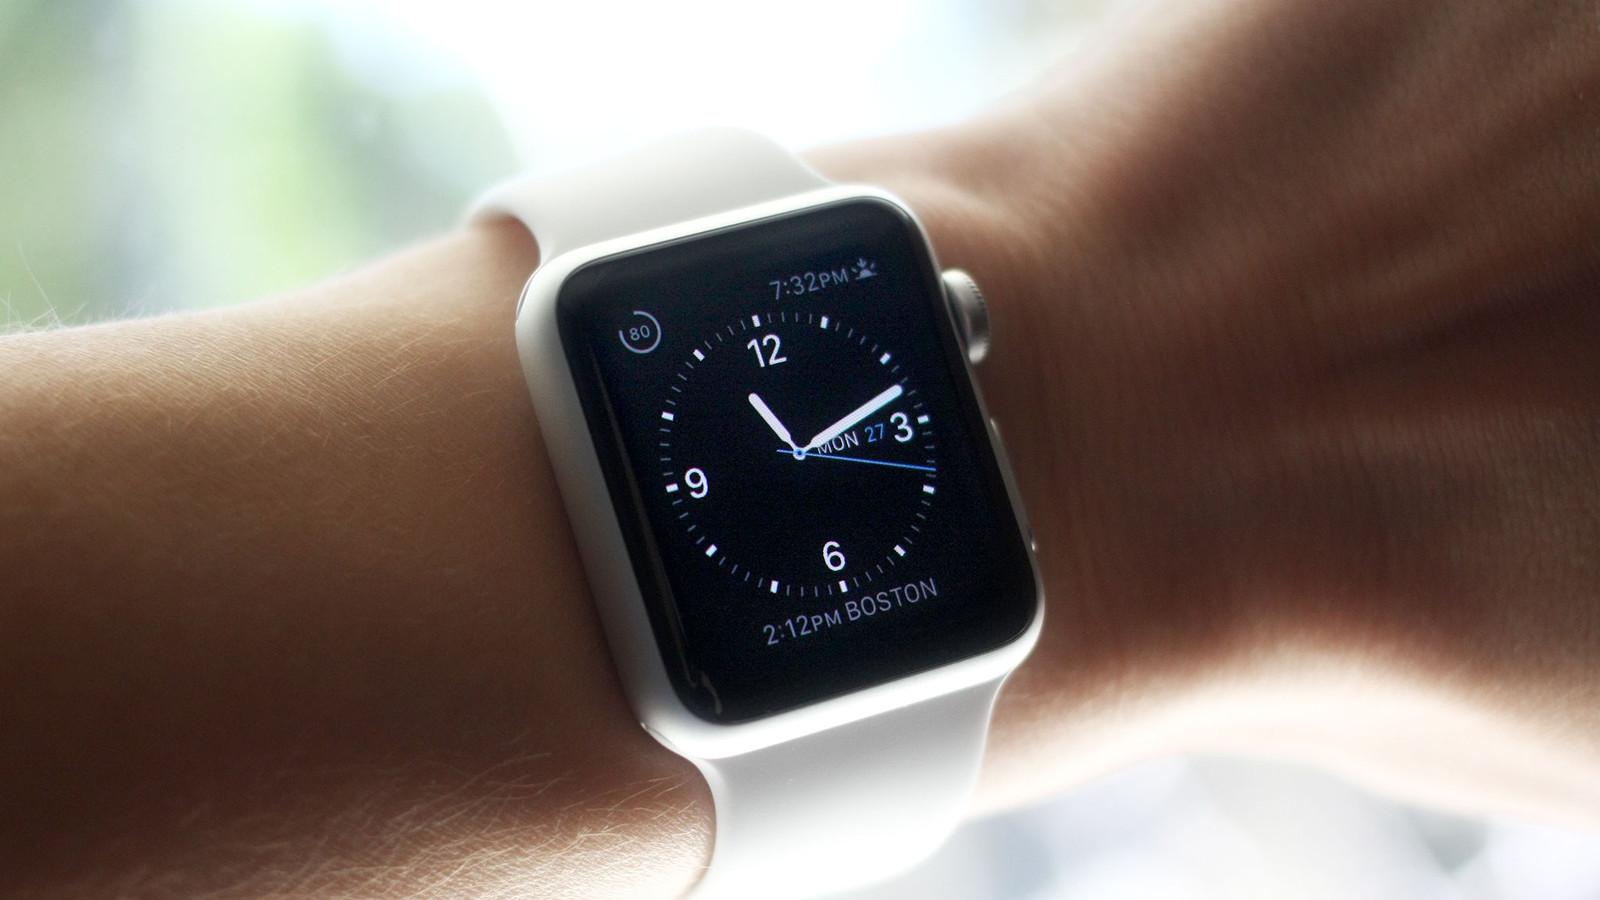 Apple returns in 2011?